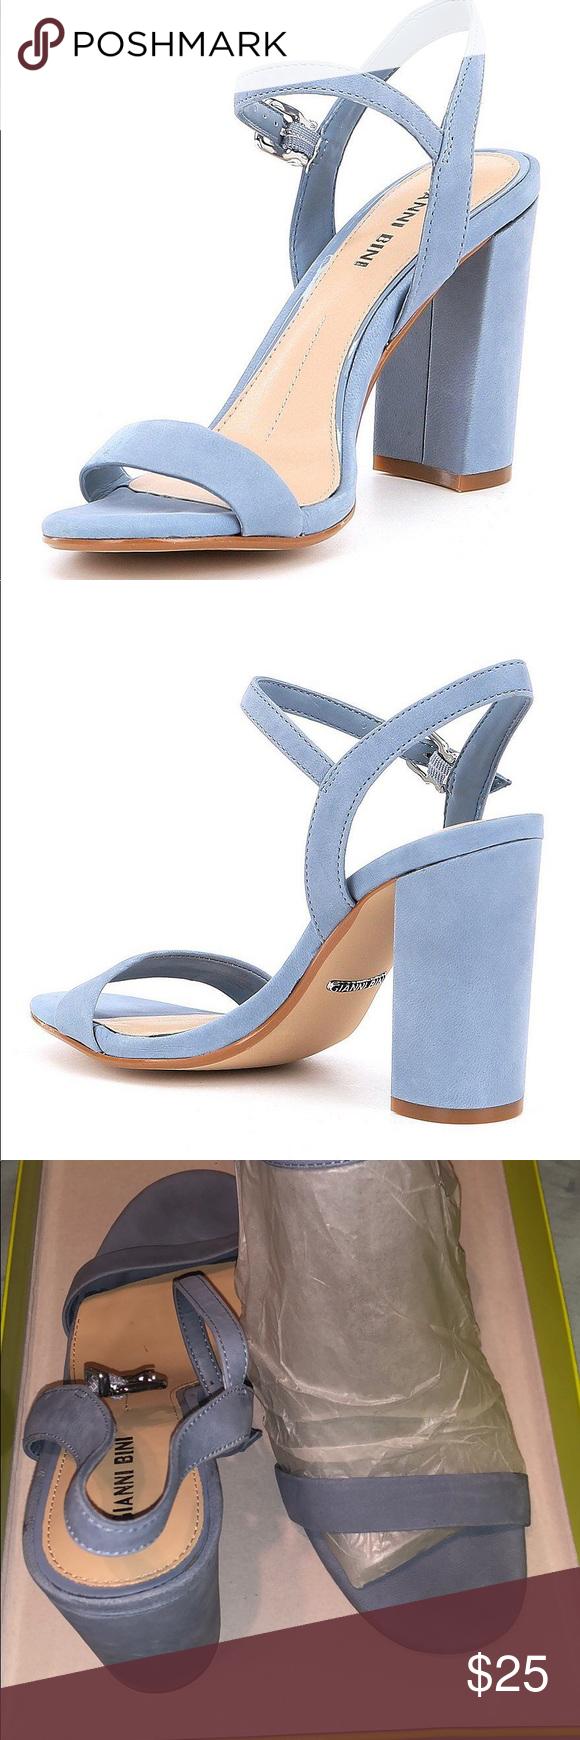 323b25e6edb Gianni Bini Mckaria block heel dress sandal Only worn once ! Comes with box  and original